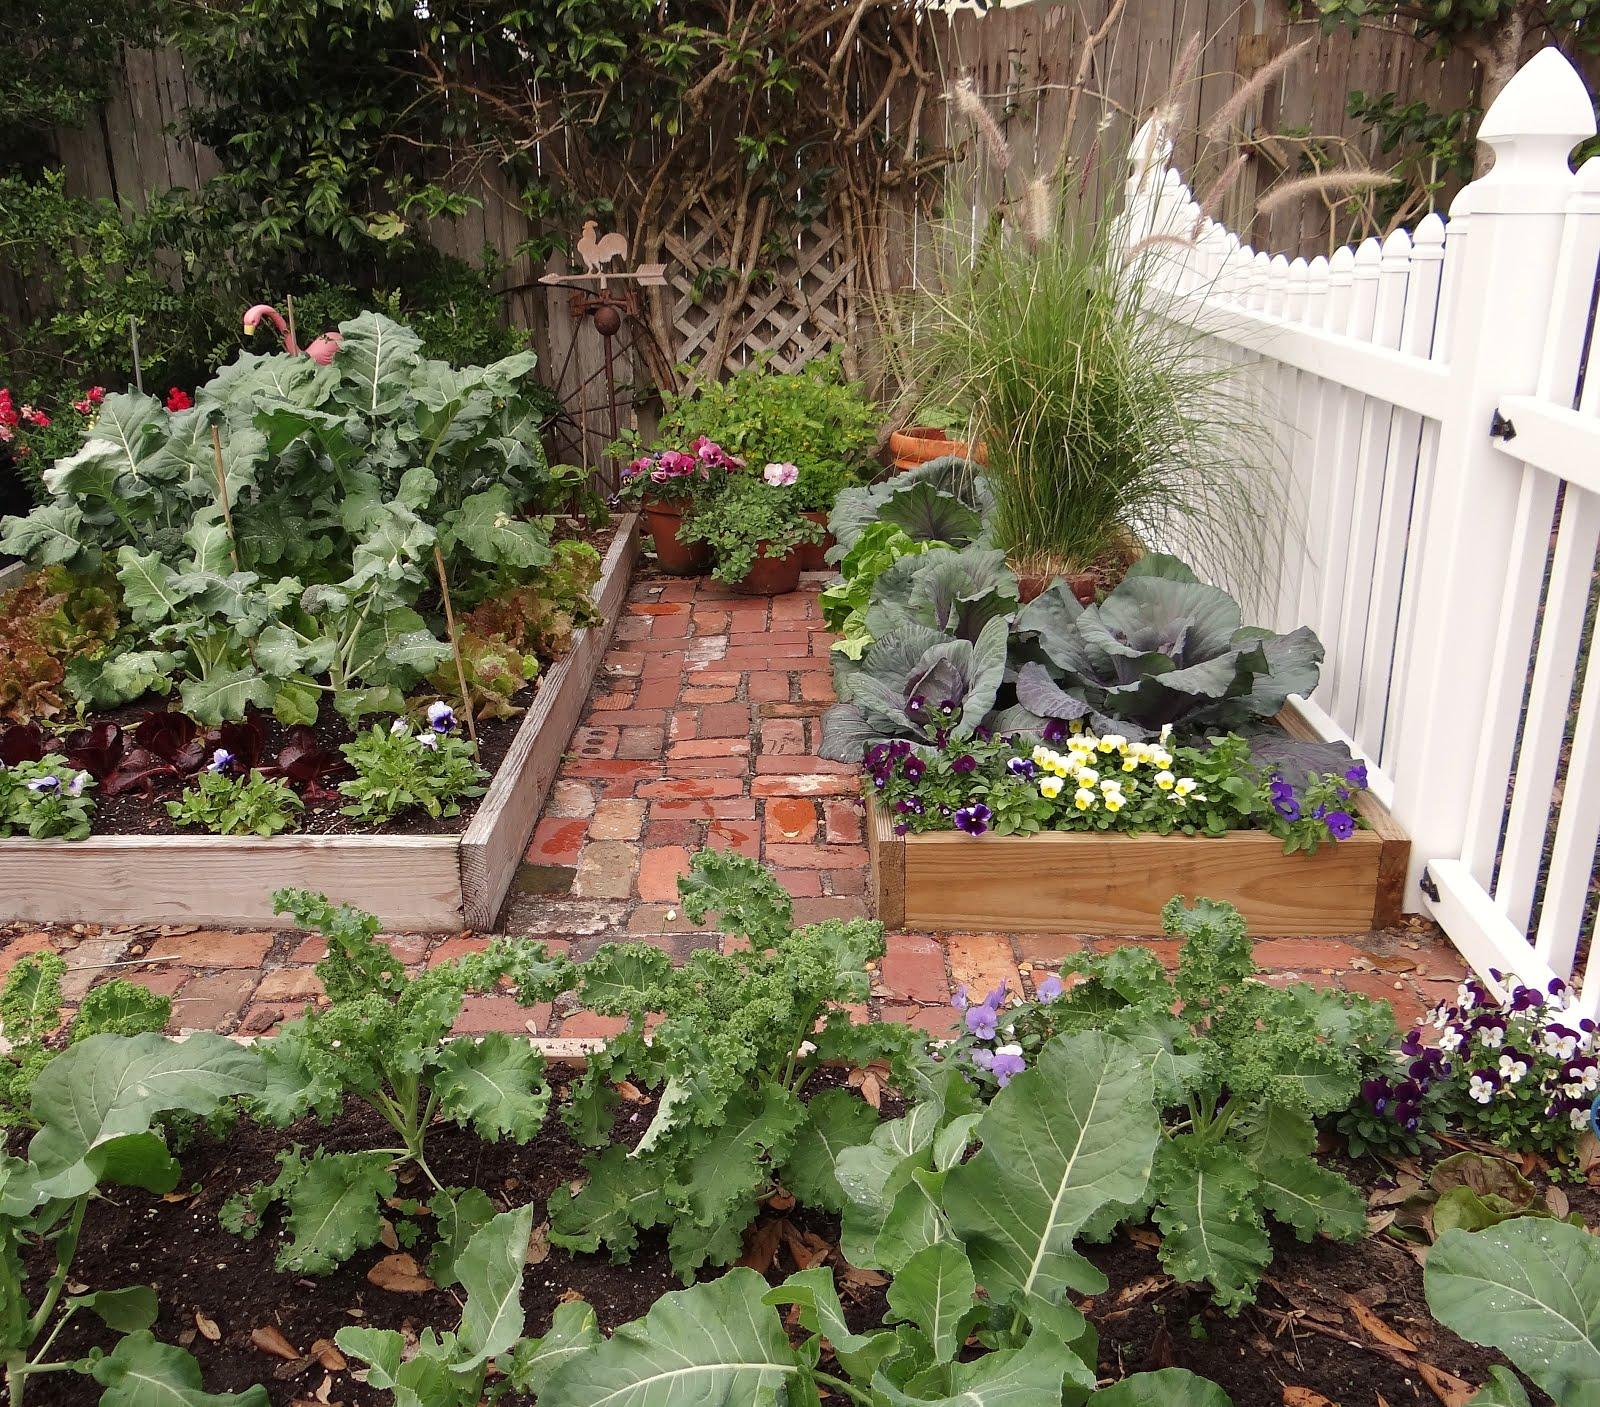 Gardening Under The Florida Sun: The Winter Garden